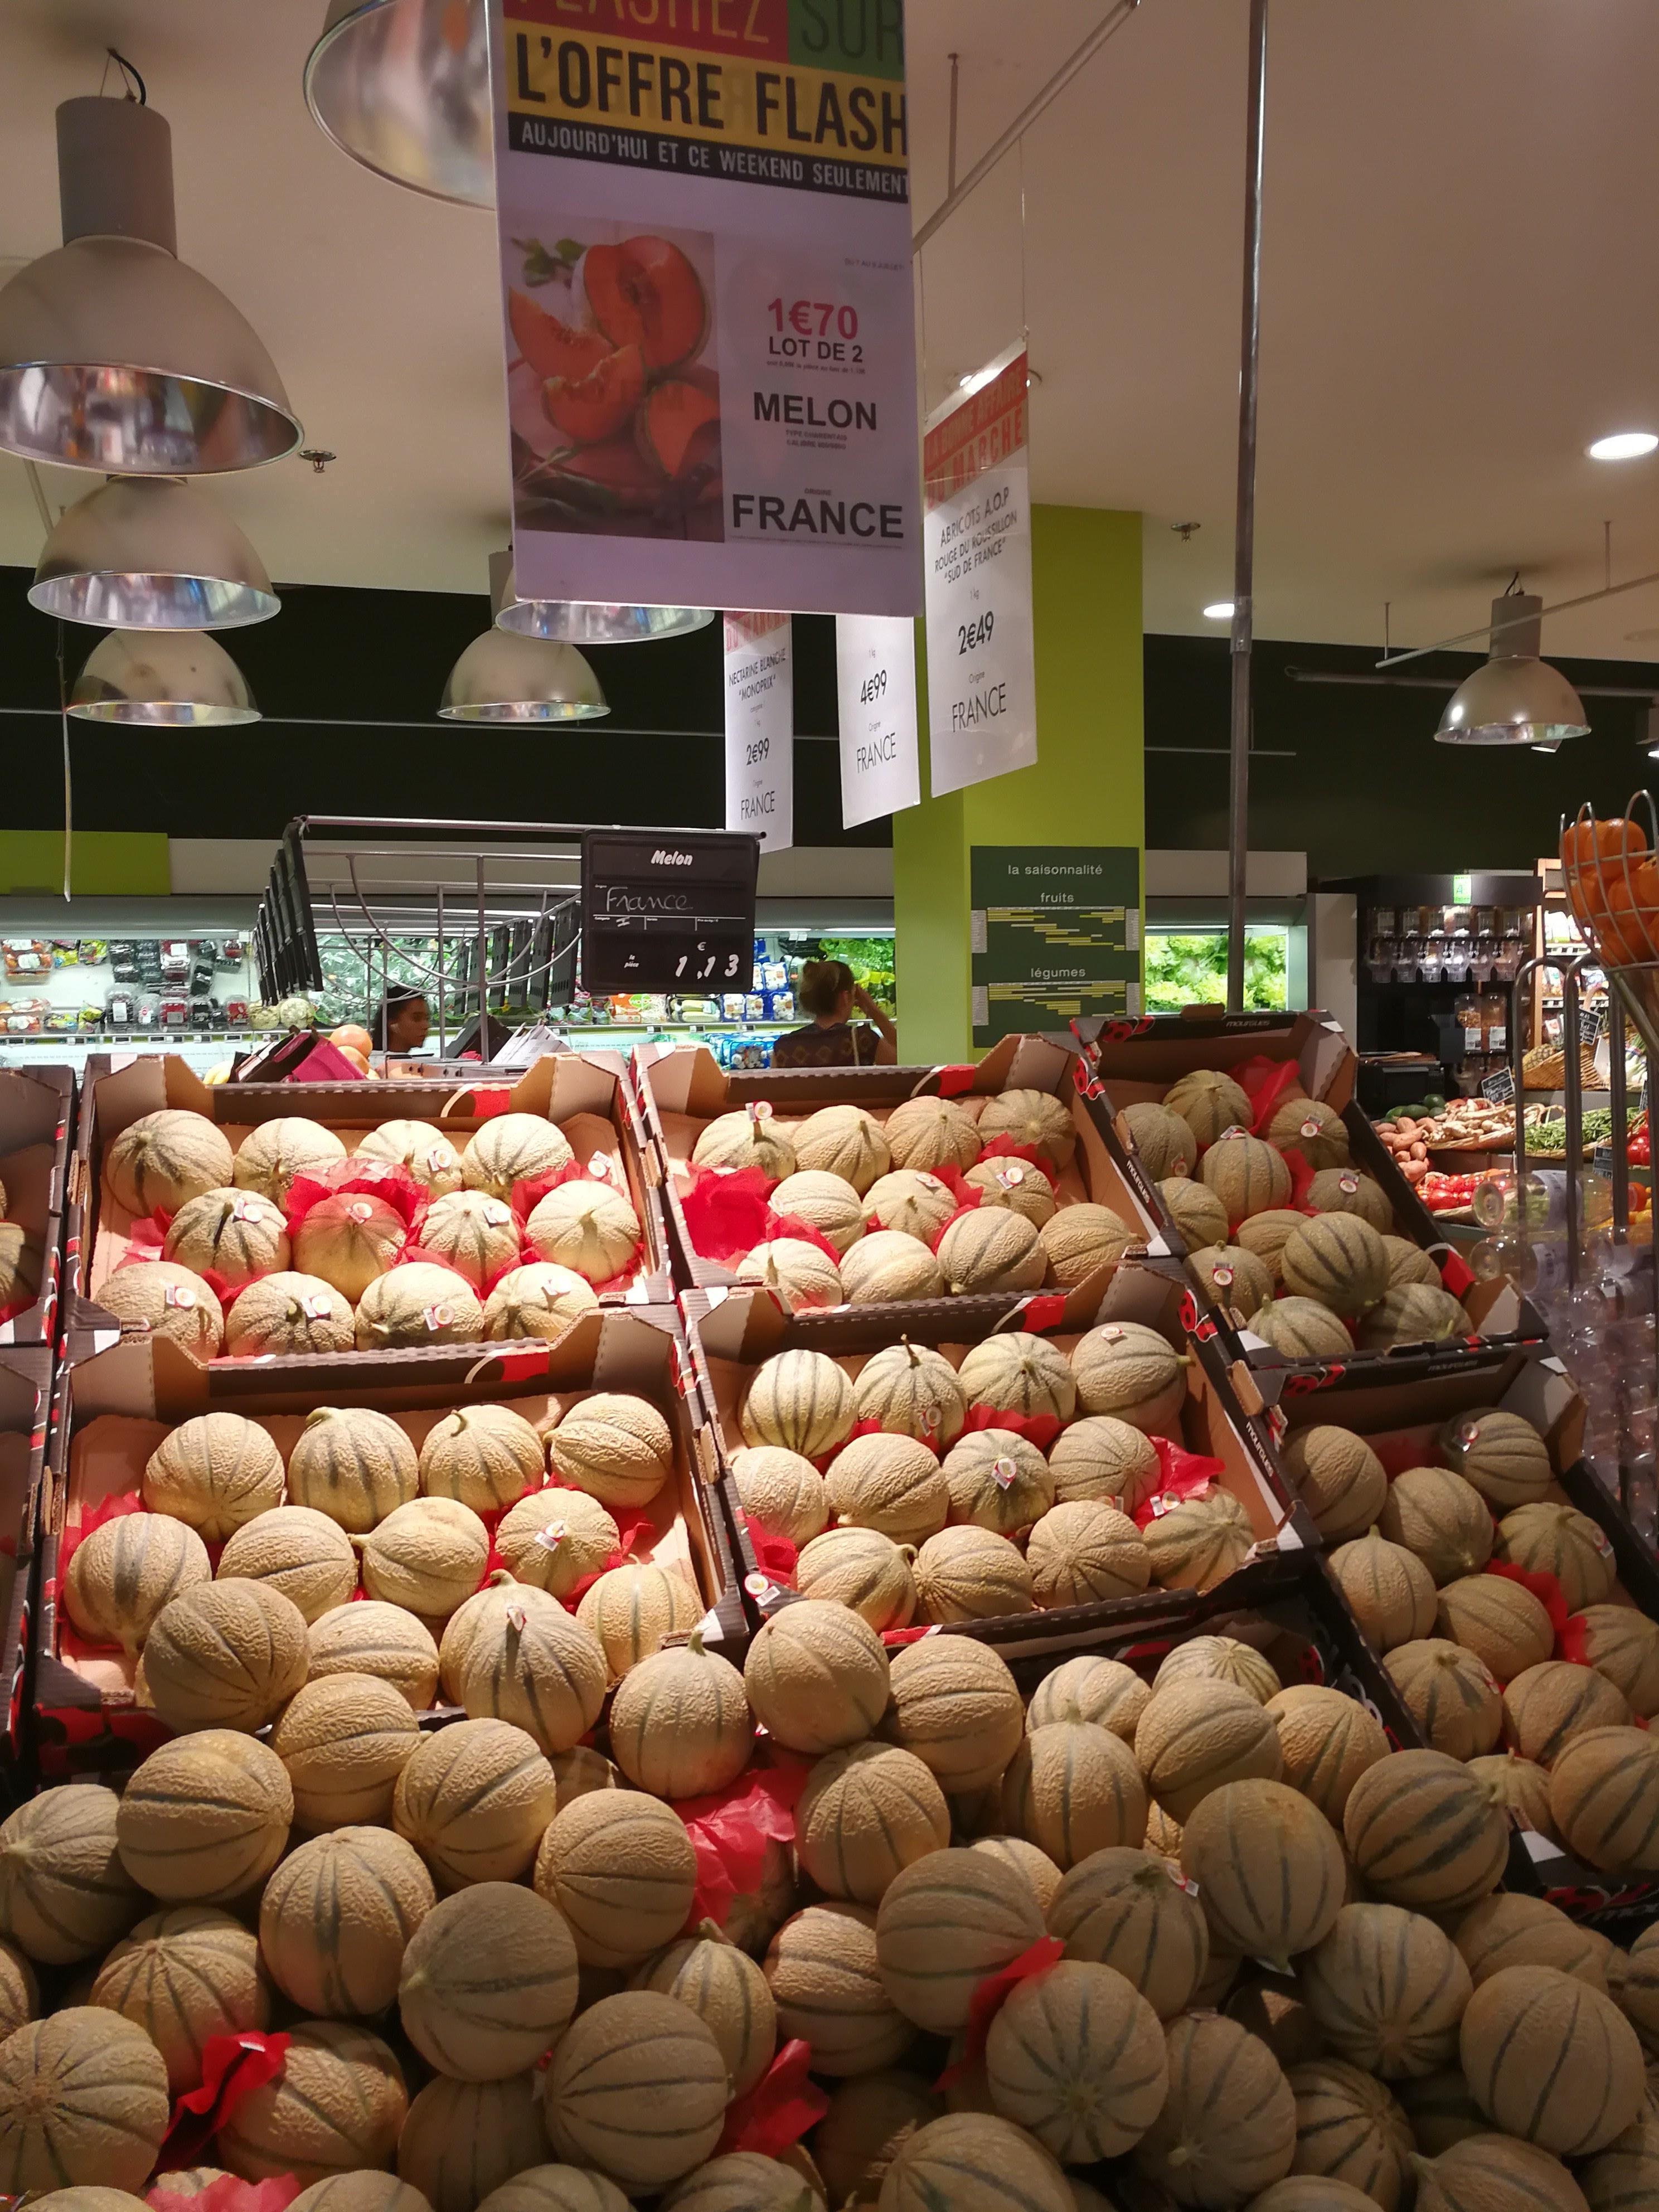 Lot de 2 melons Charentais - 800 / 950 g